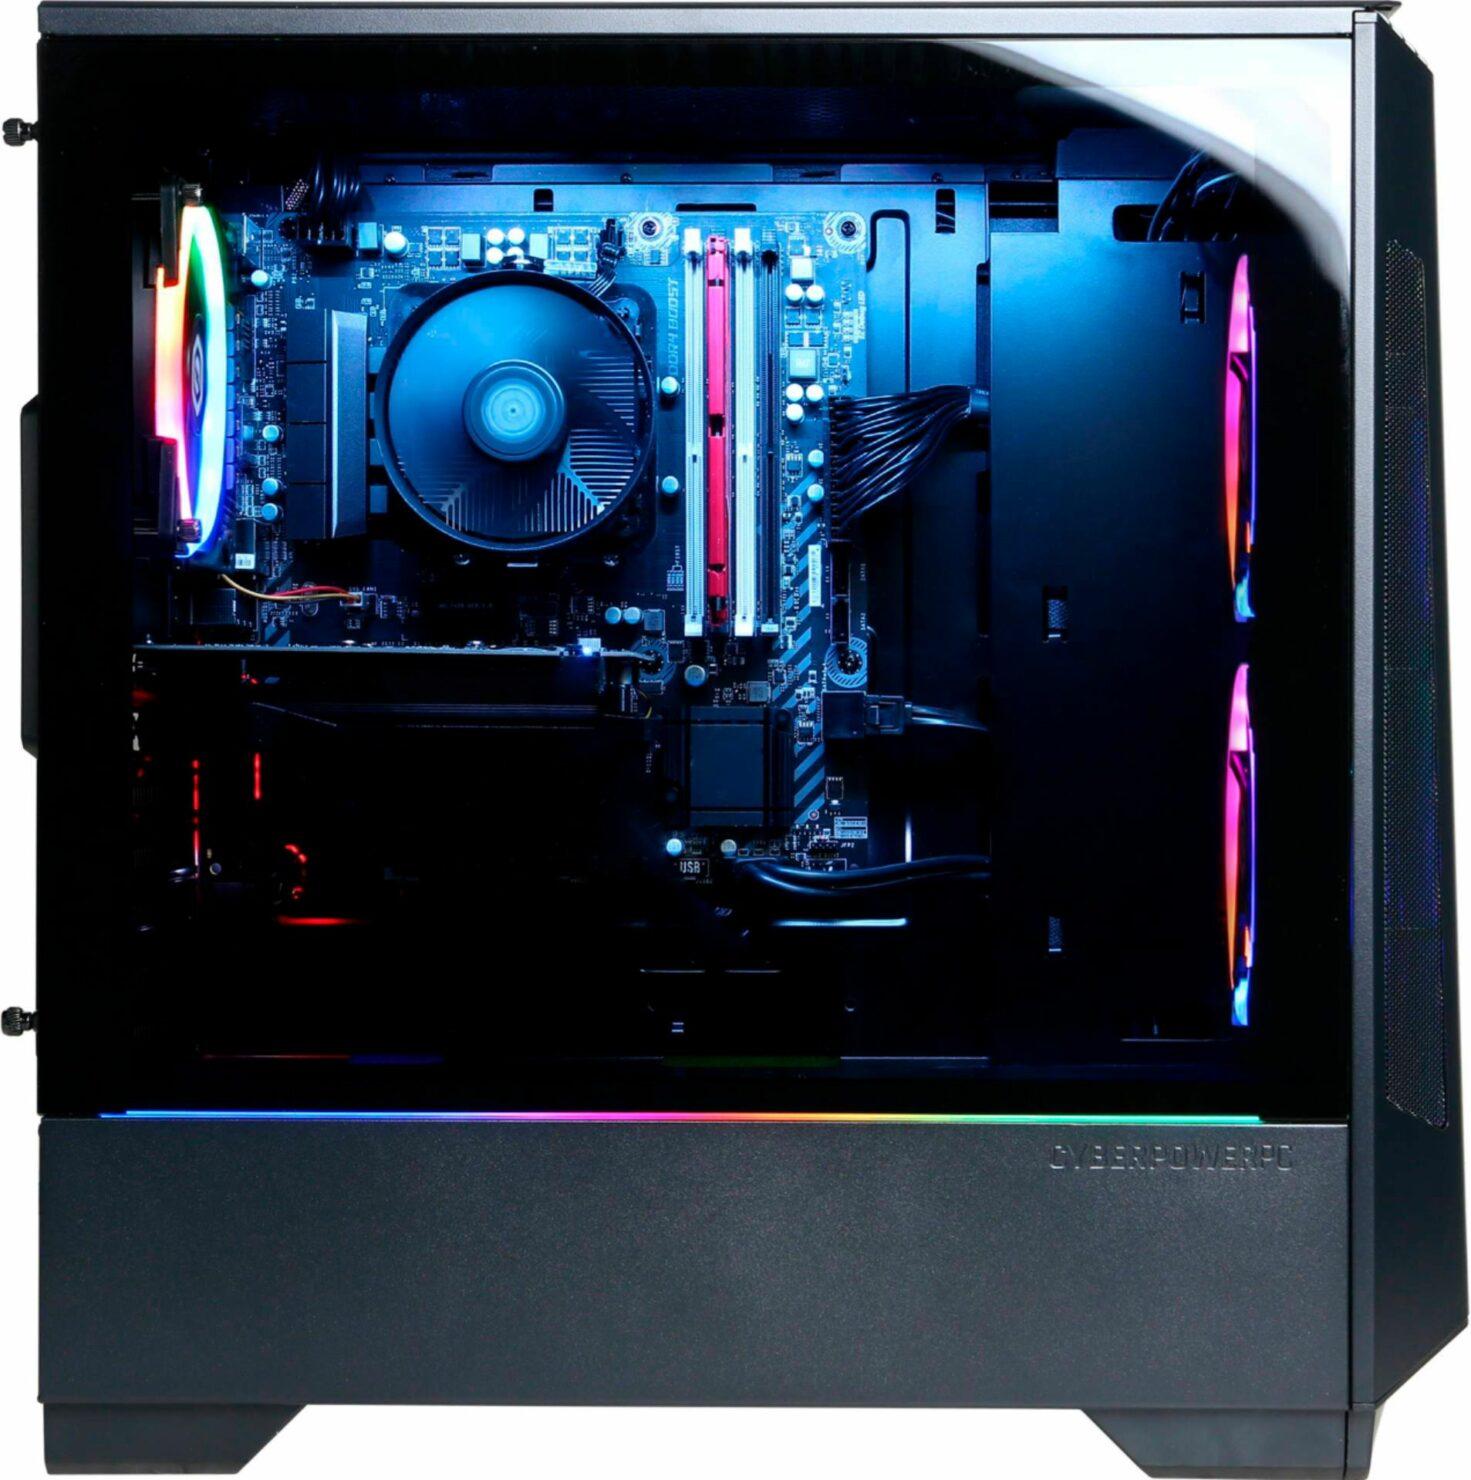 cyberpowerpc-intel-xe-lp-dg1-gpu-powered-graphics-card-gaming-pc-_1